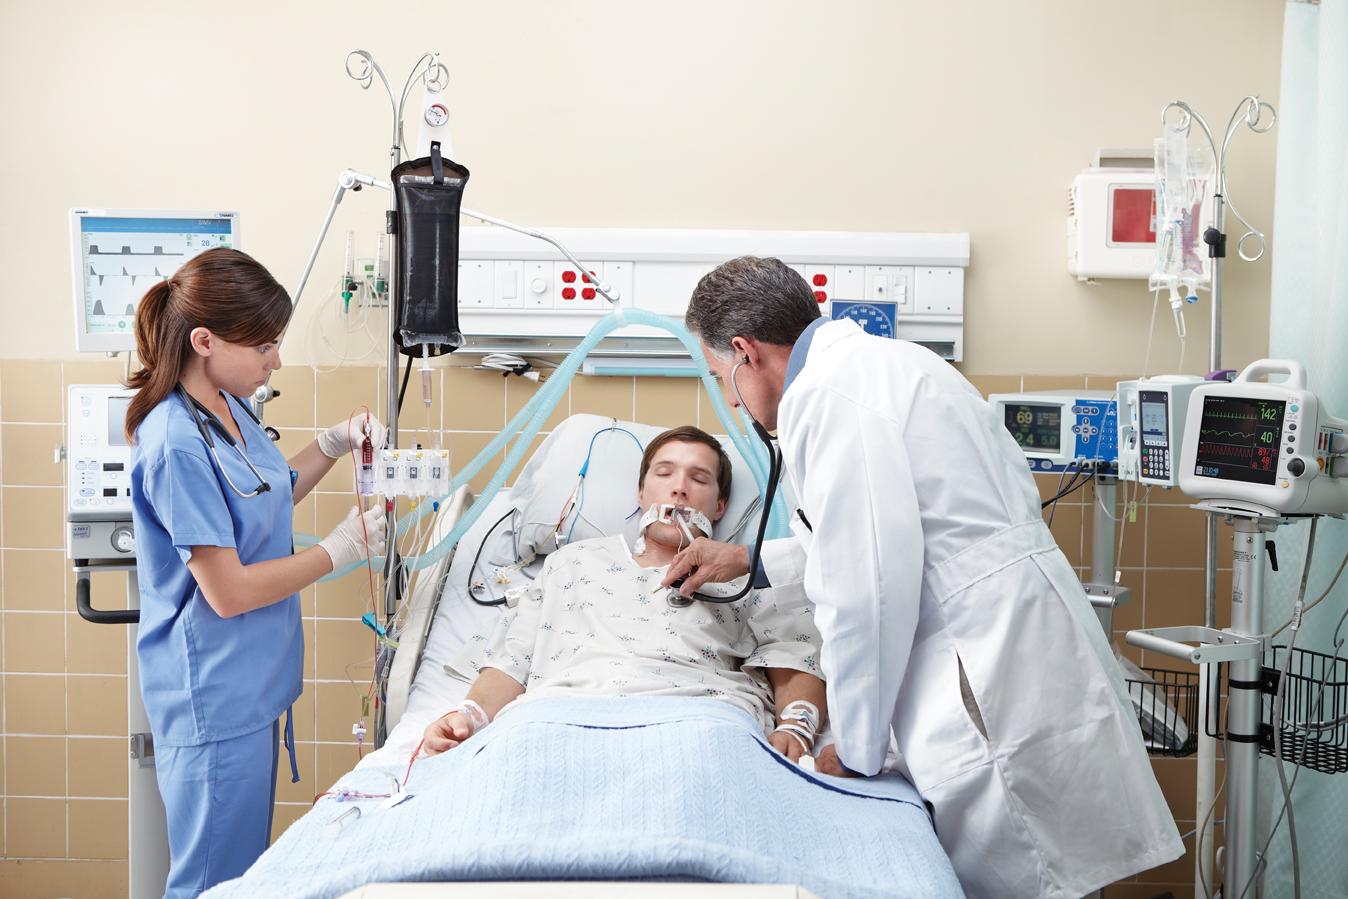 Clinicians_in_Intensive_Care_Unit